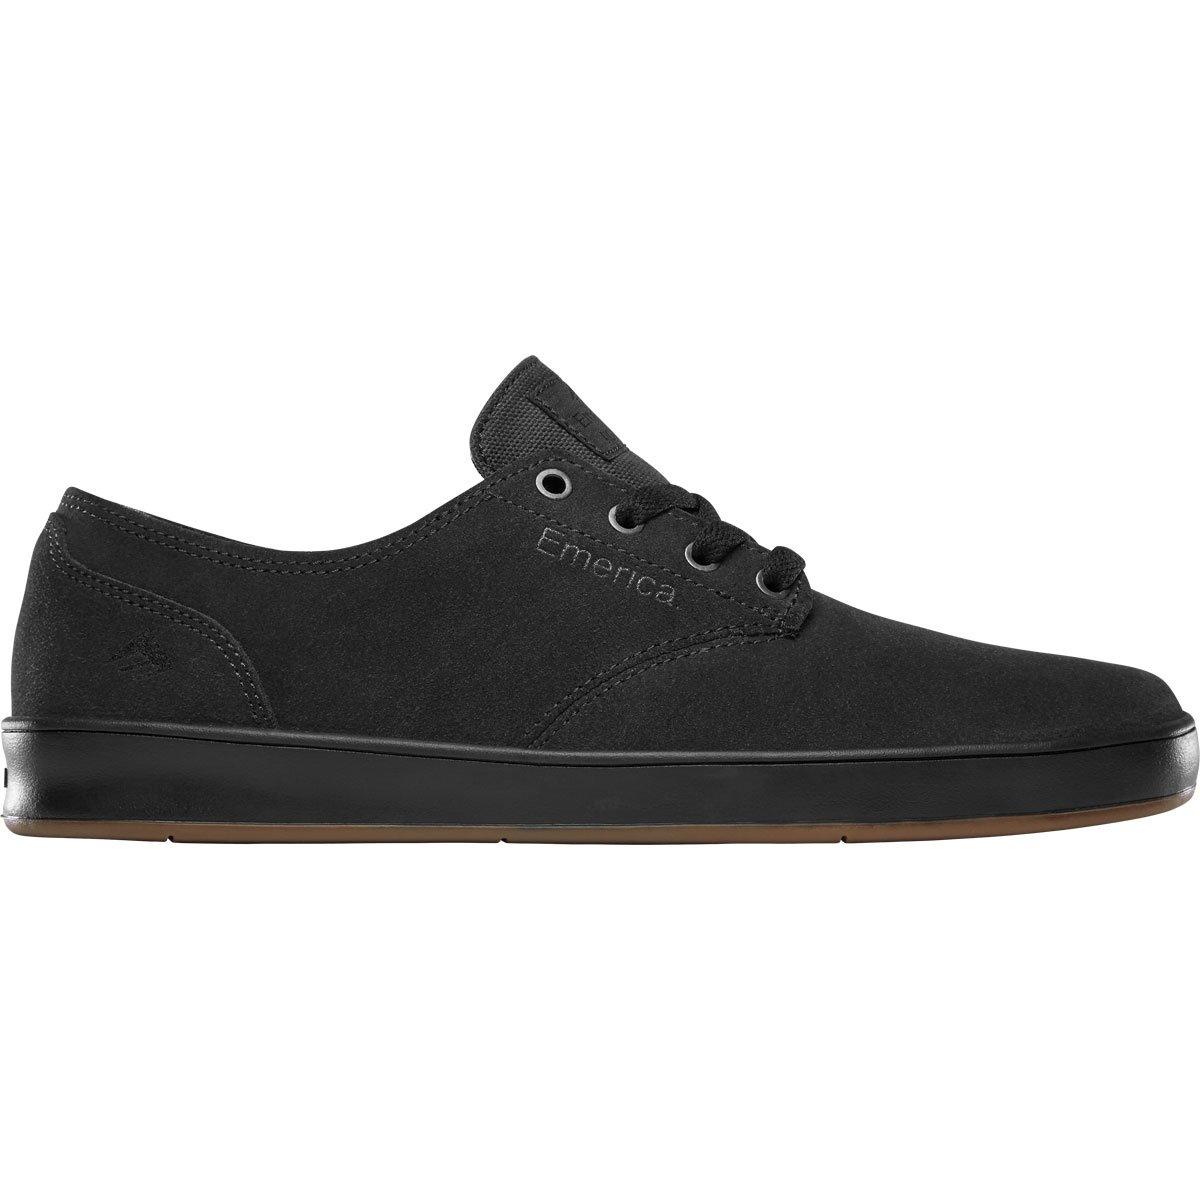 Emerica Men\'s The Romero Laced Skate Shoe Dark Grey/Black/Gum